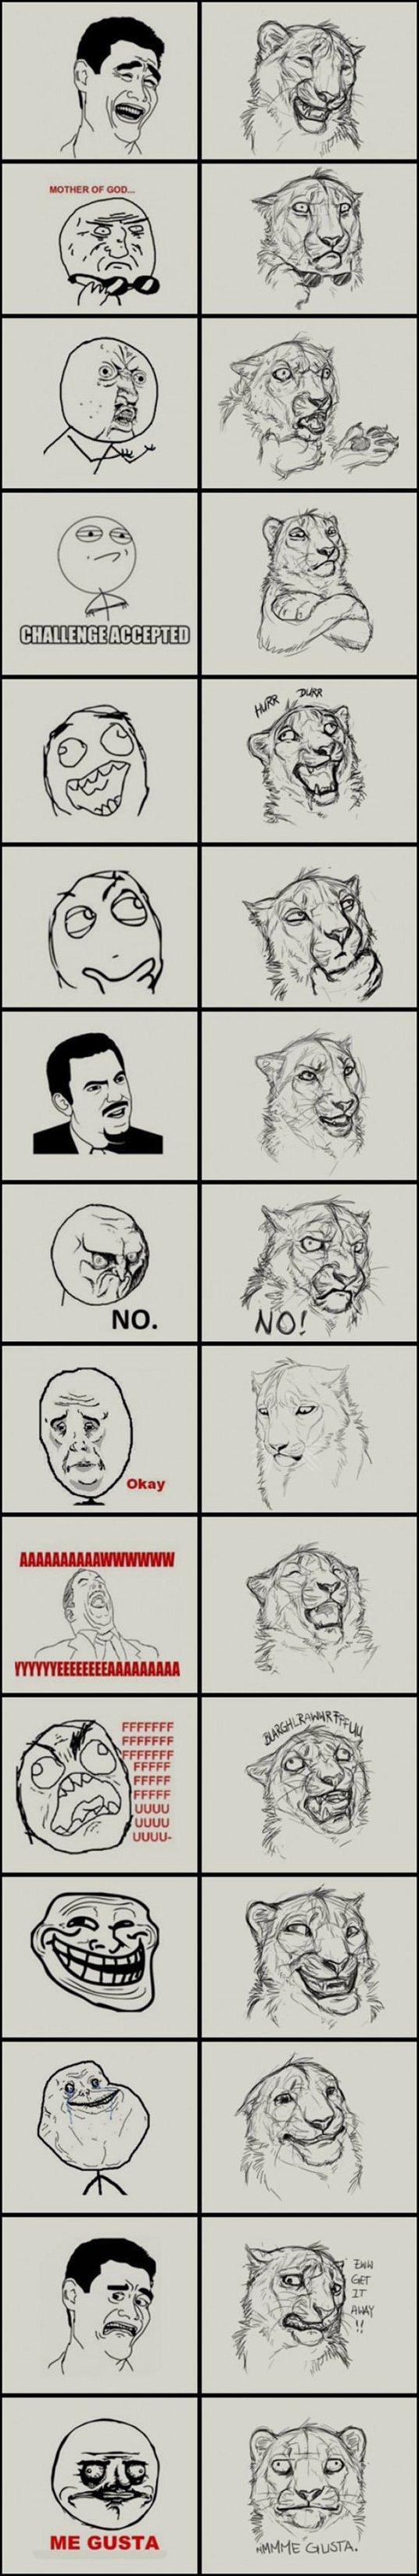 Jungle memes